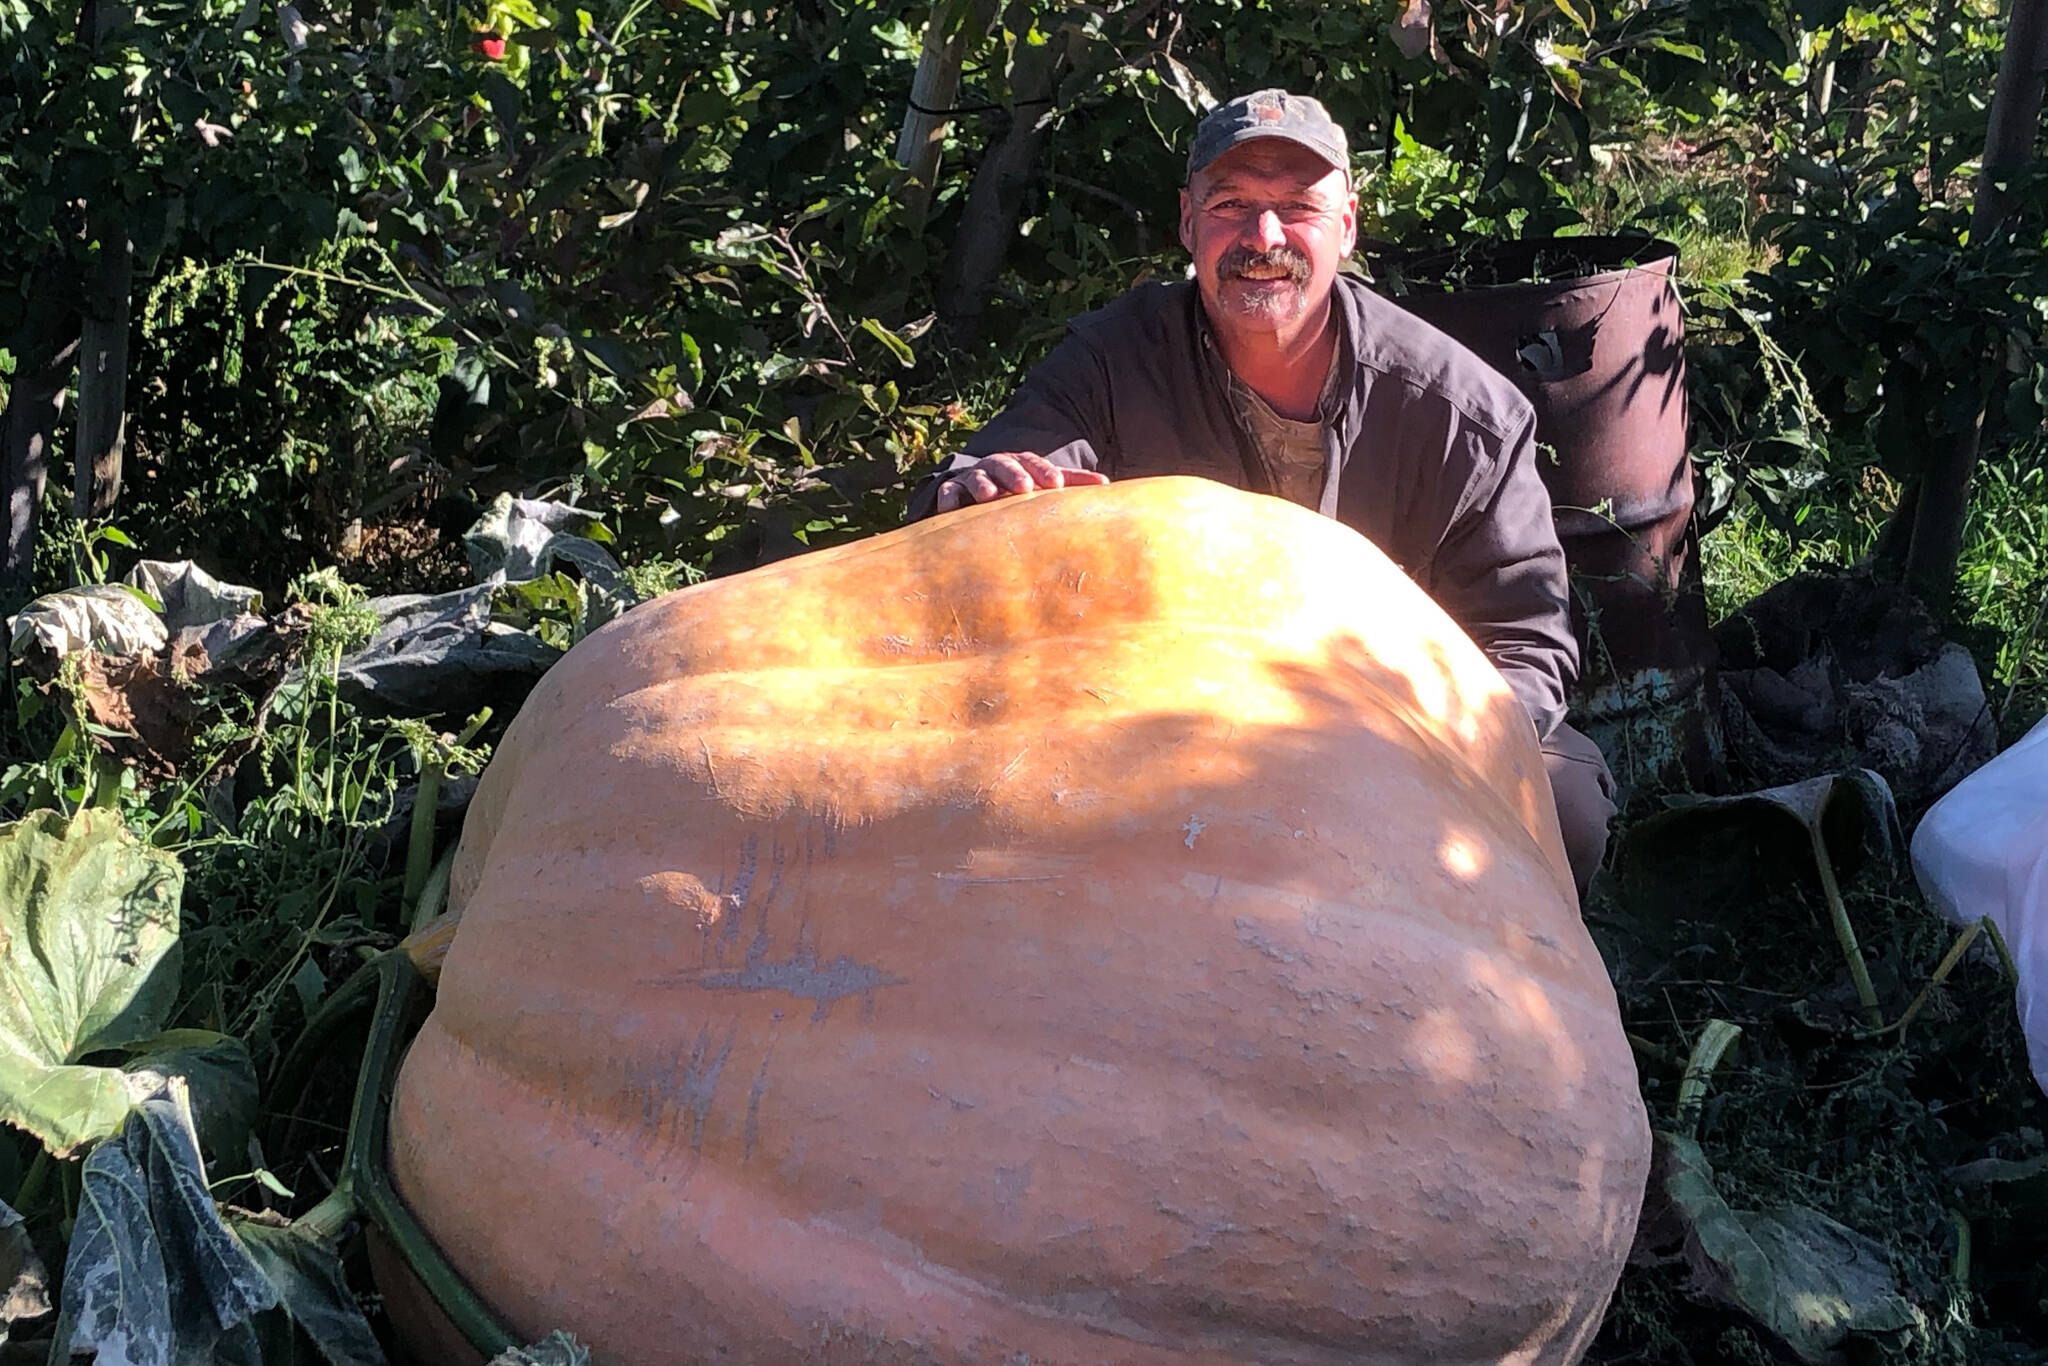 Billy Boerboom shows a massive pumpkin grown at his farm in Summerland. (Black Press file photo)